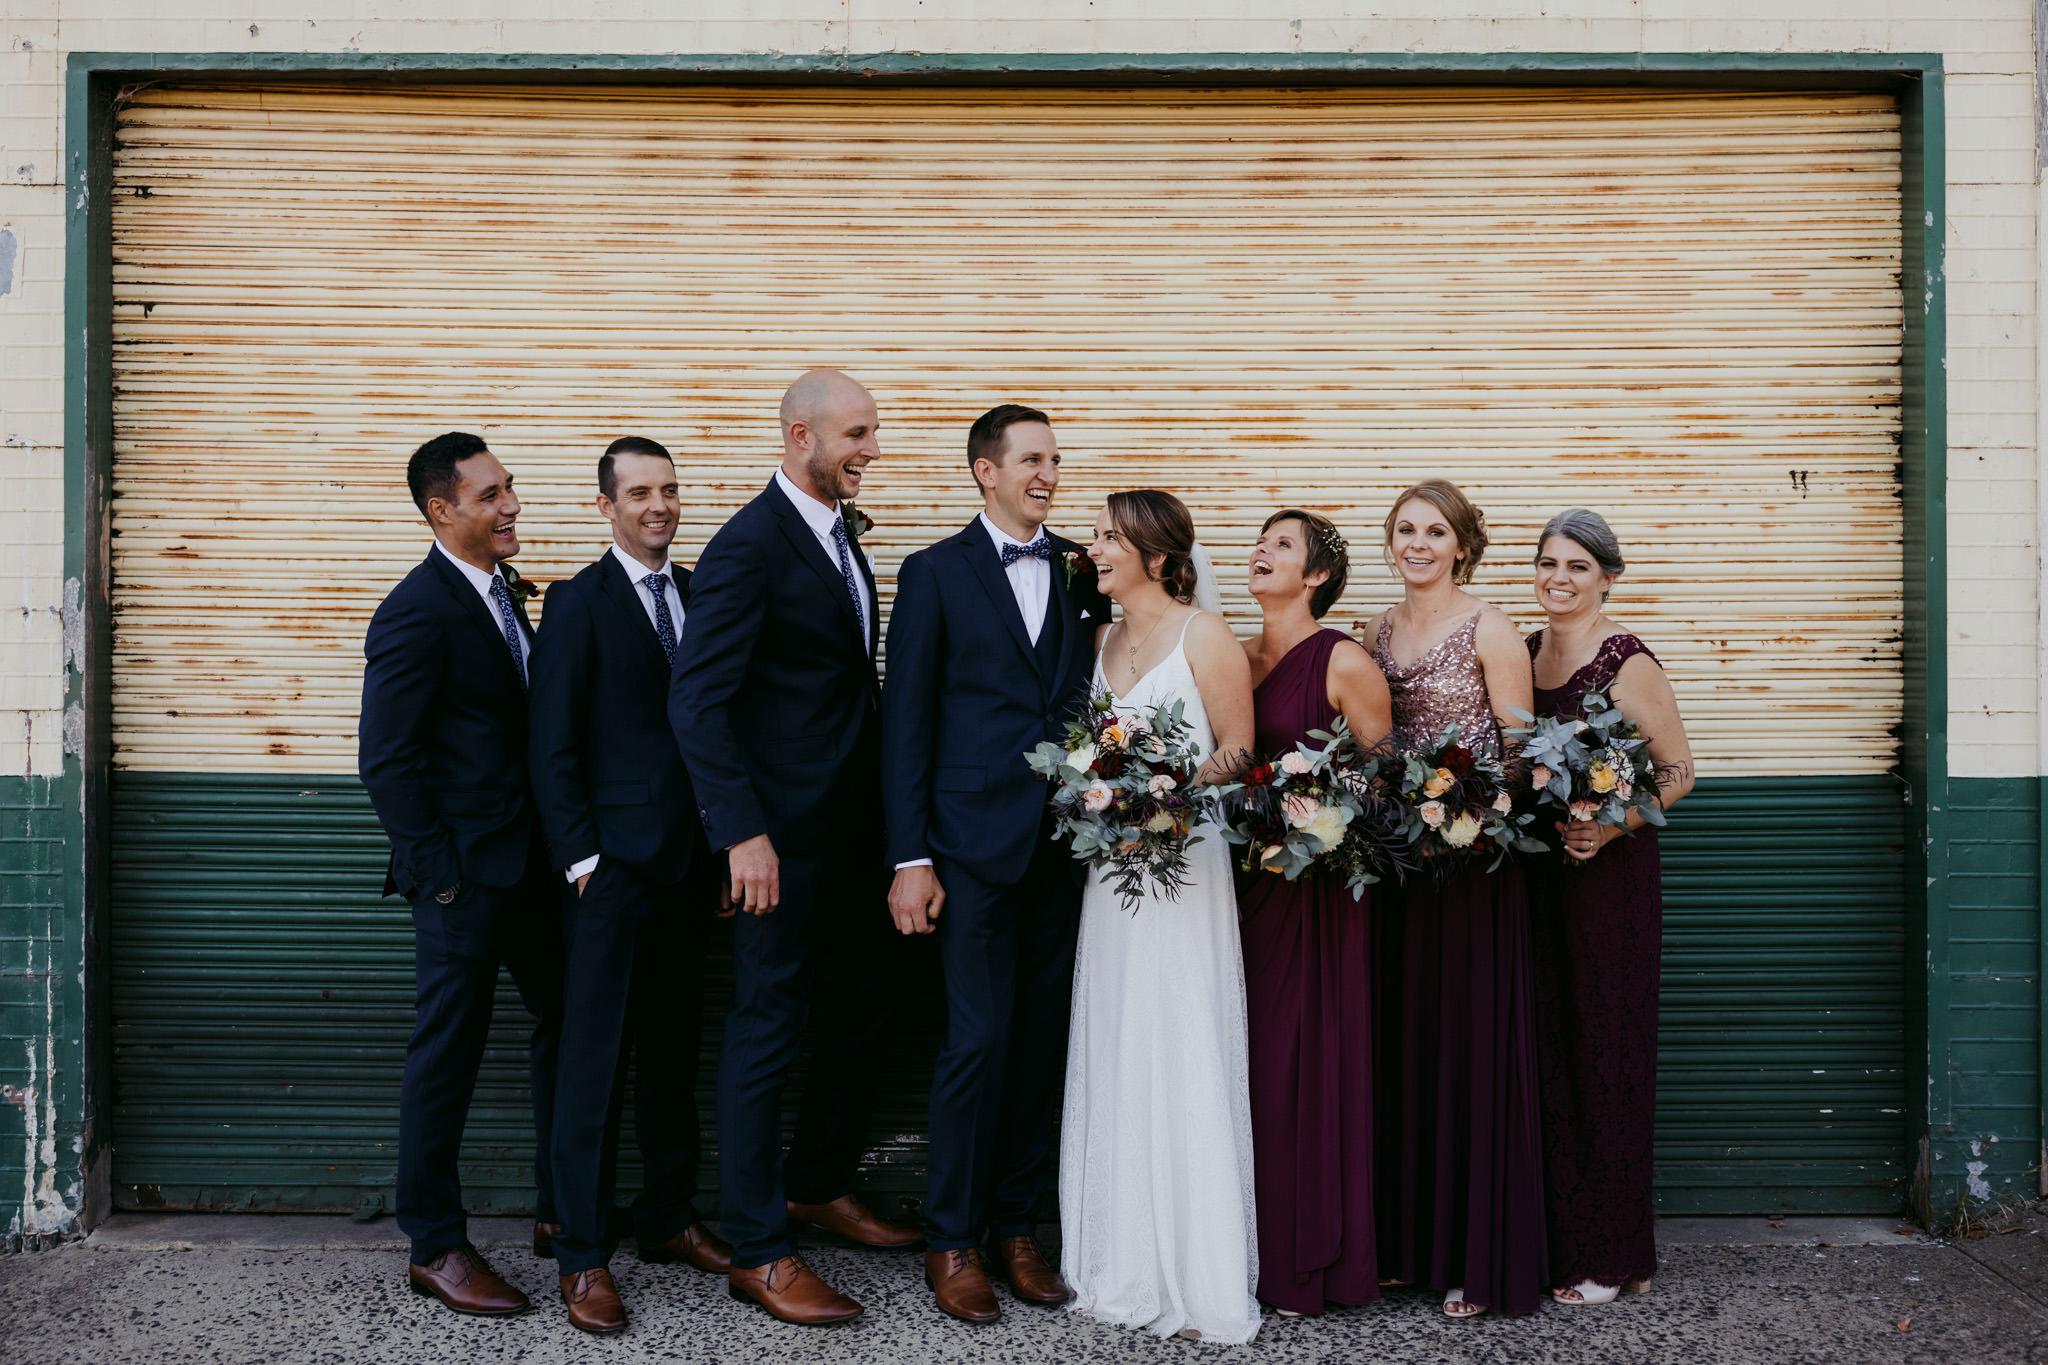 Erin Latimore Mudgee Canberra Wedding Photographer ROSEBANK GUESTHOUSE OLD THEATRE TONIC MILLTHORPE_524.JPG